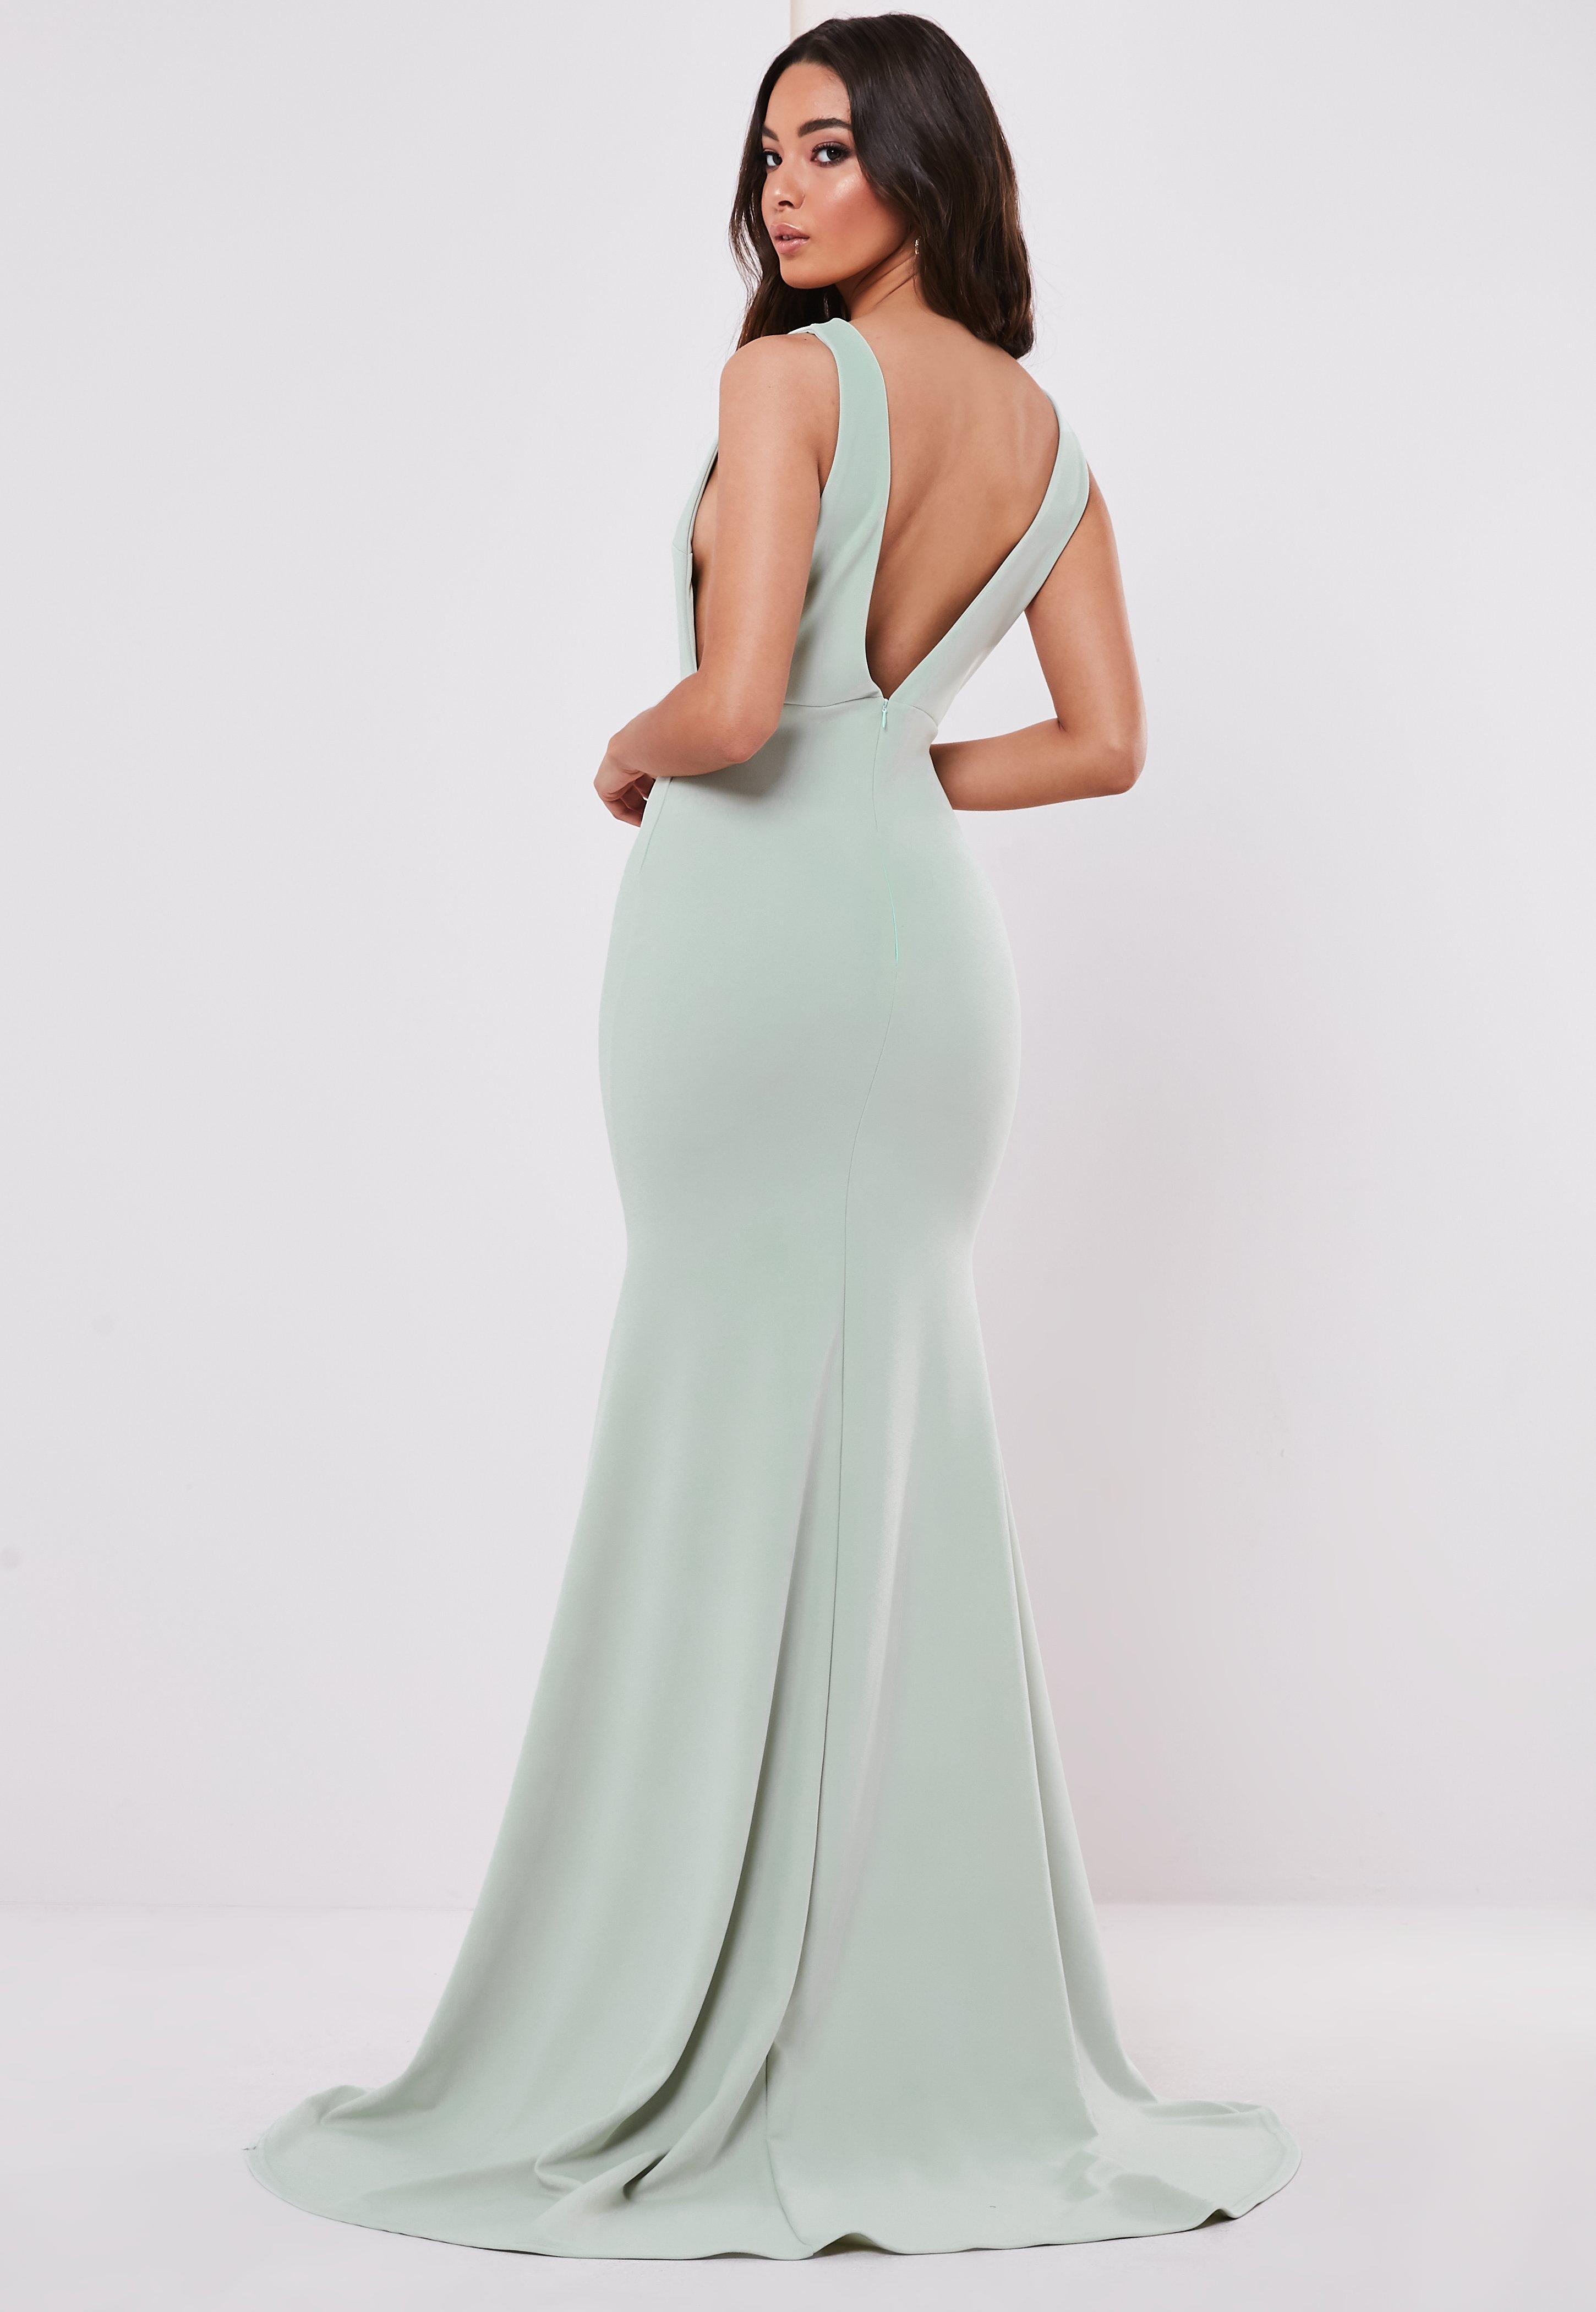 b7c6b4e731 Maxi Dresses | Long Dresses Online - Missguided Australia